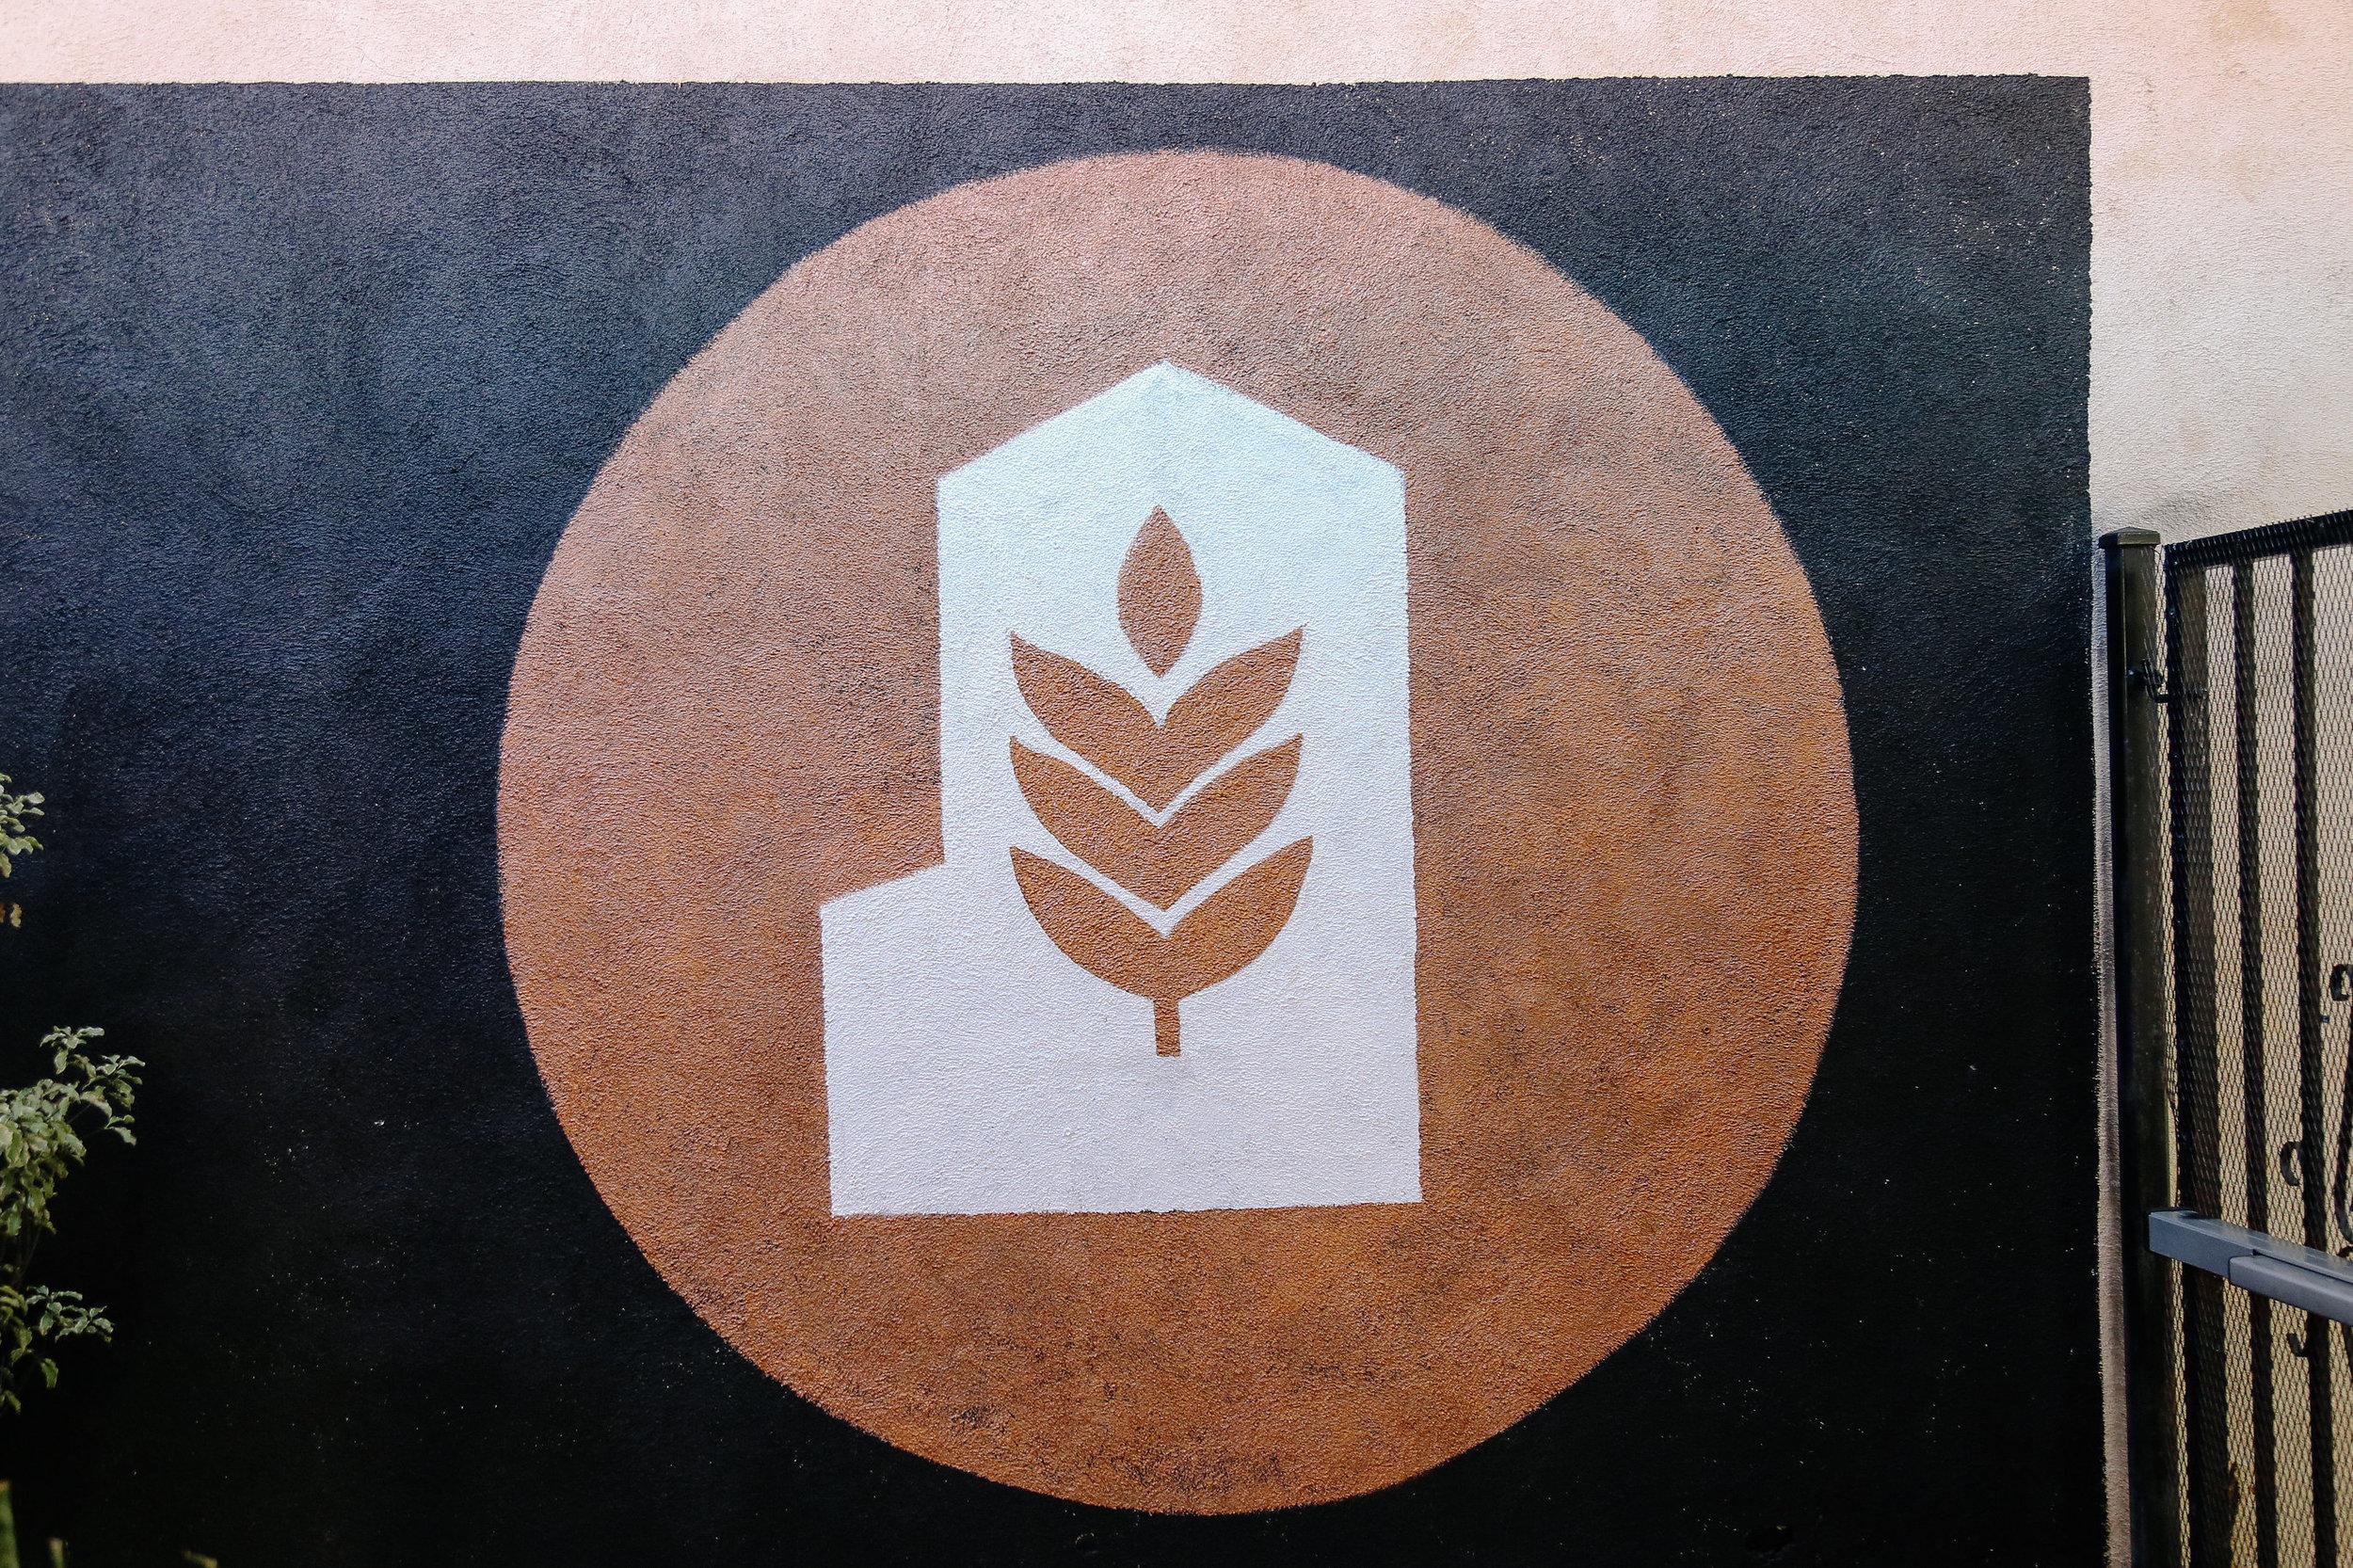 flour-house-slo-kendra-aronson-537.jpg